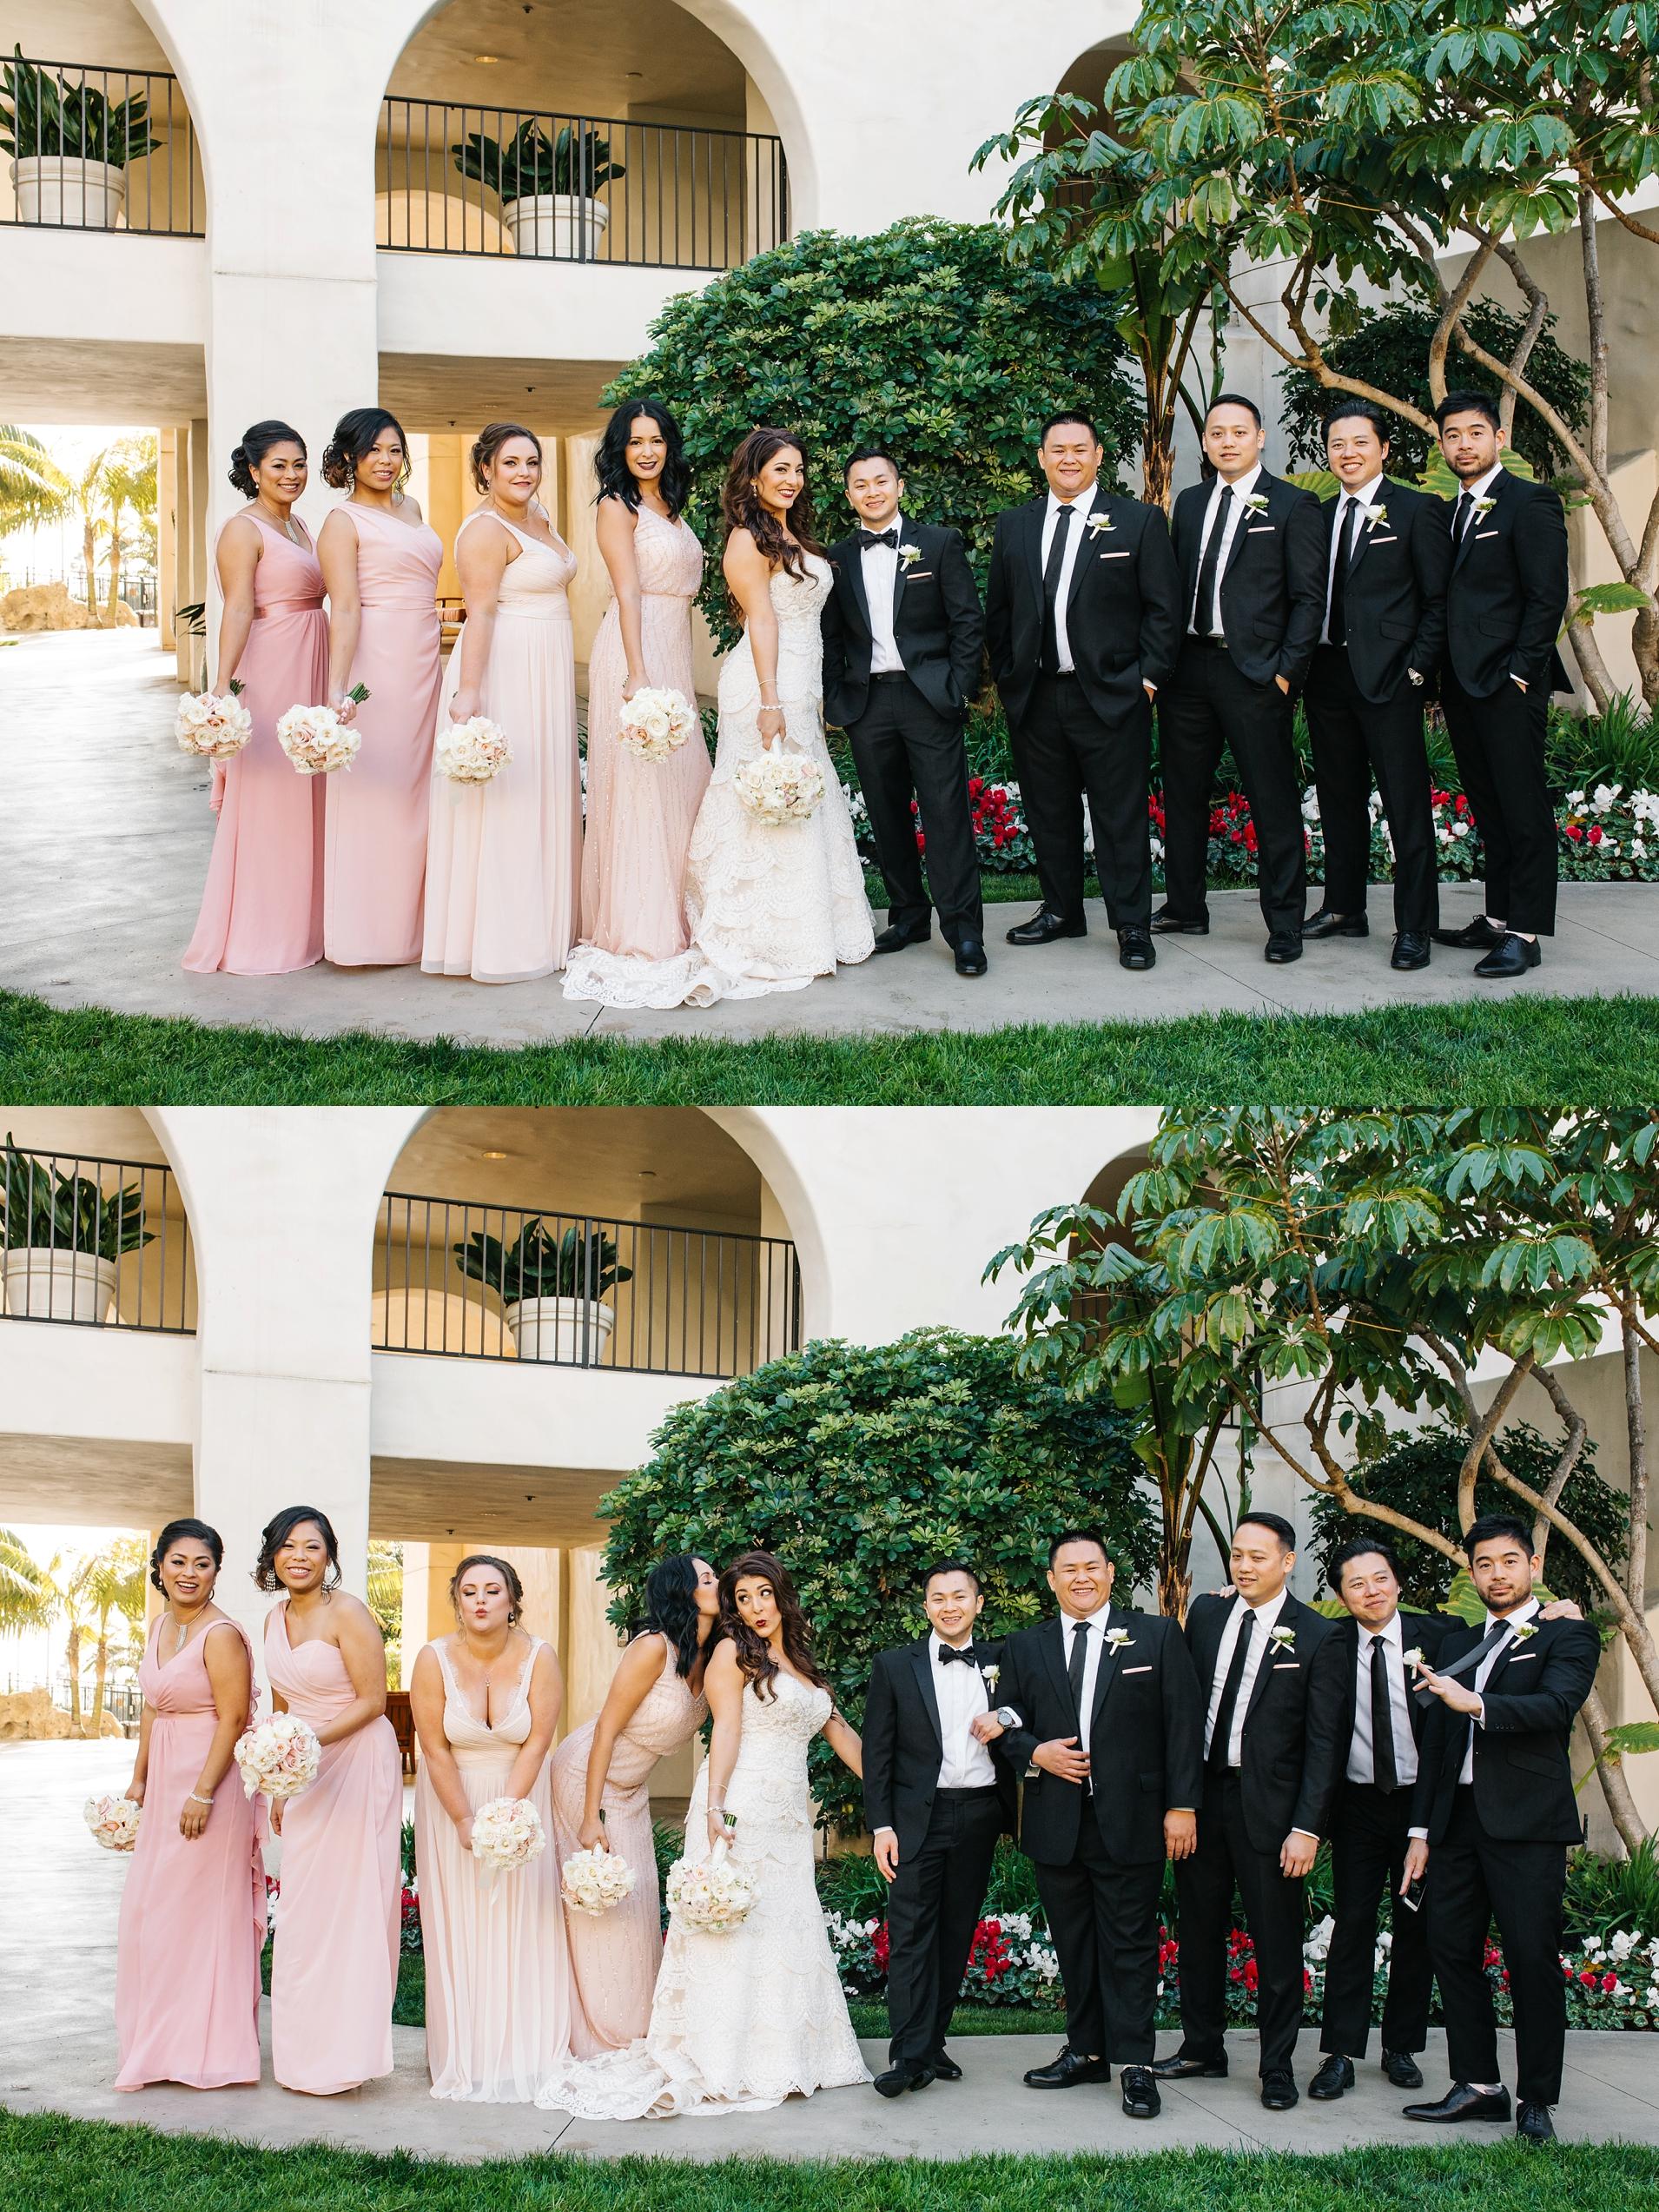 Bridal Party Photos in Huntington Beach, CA